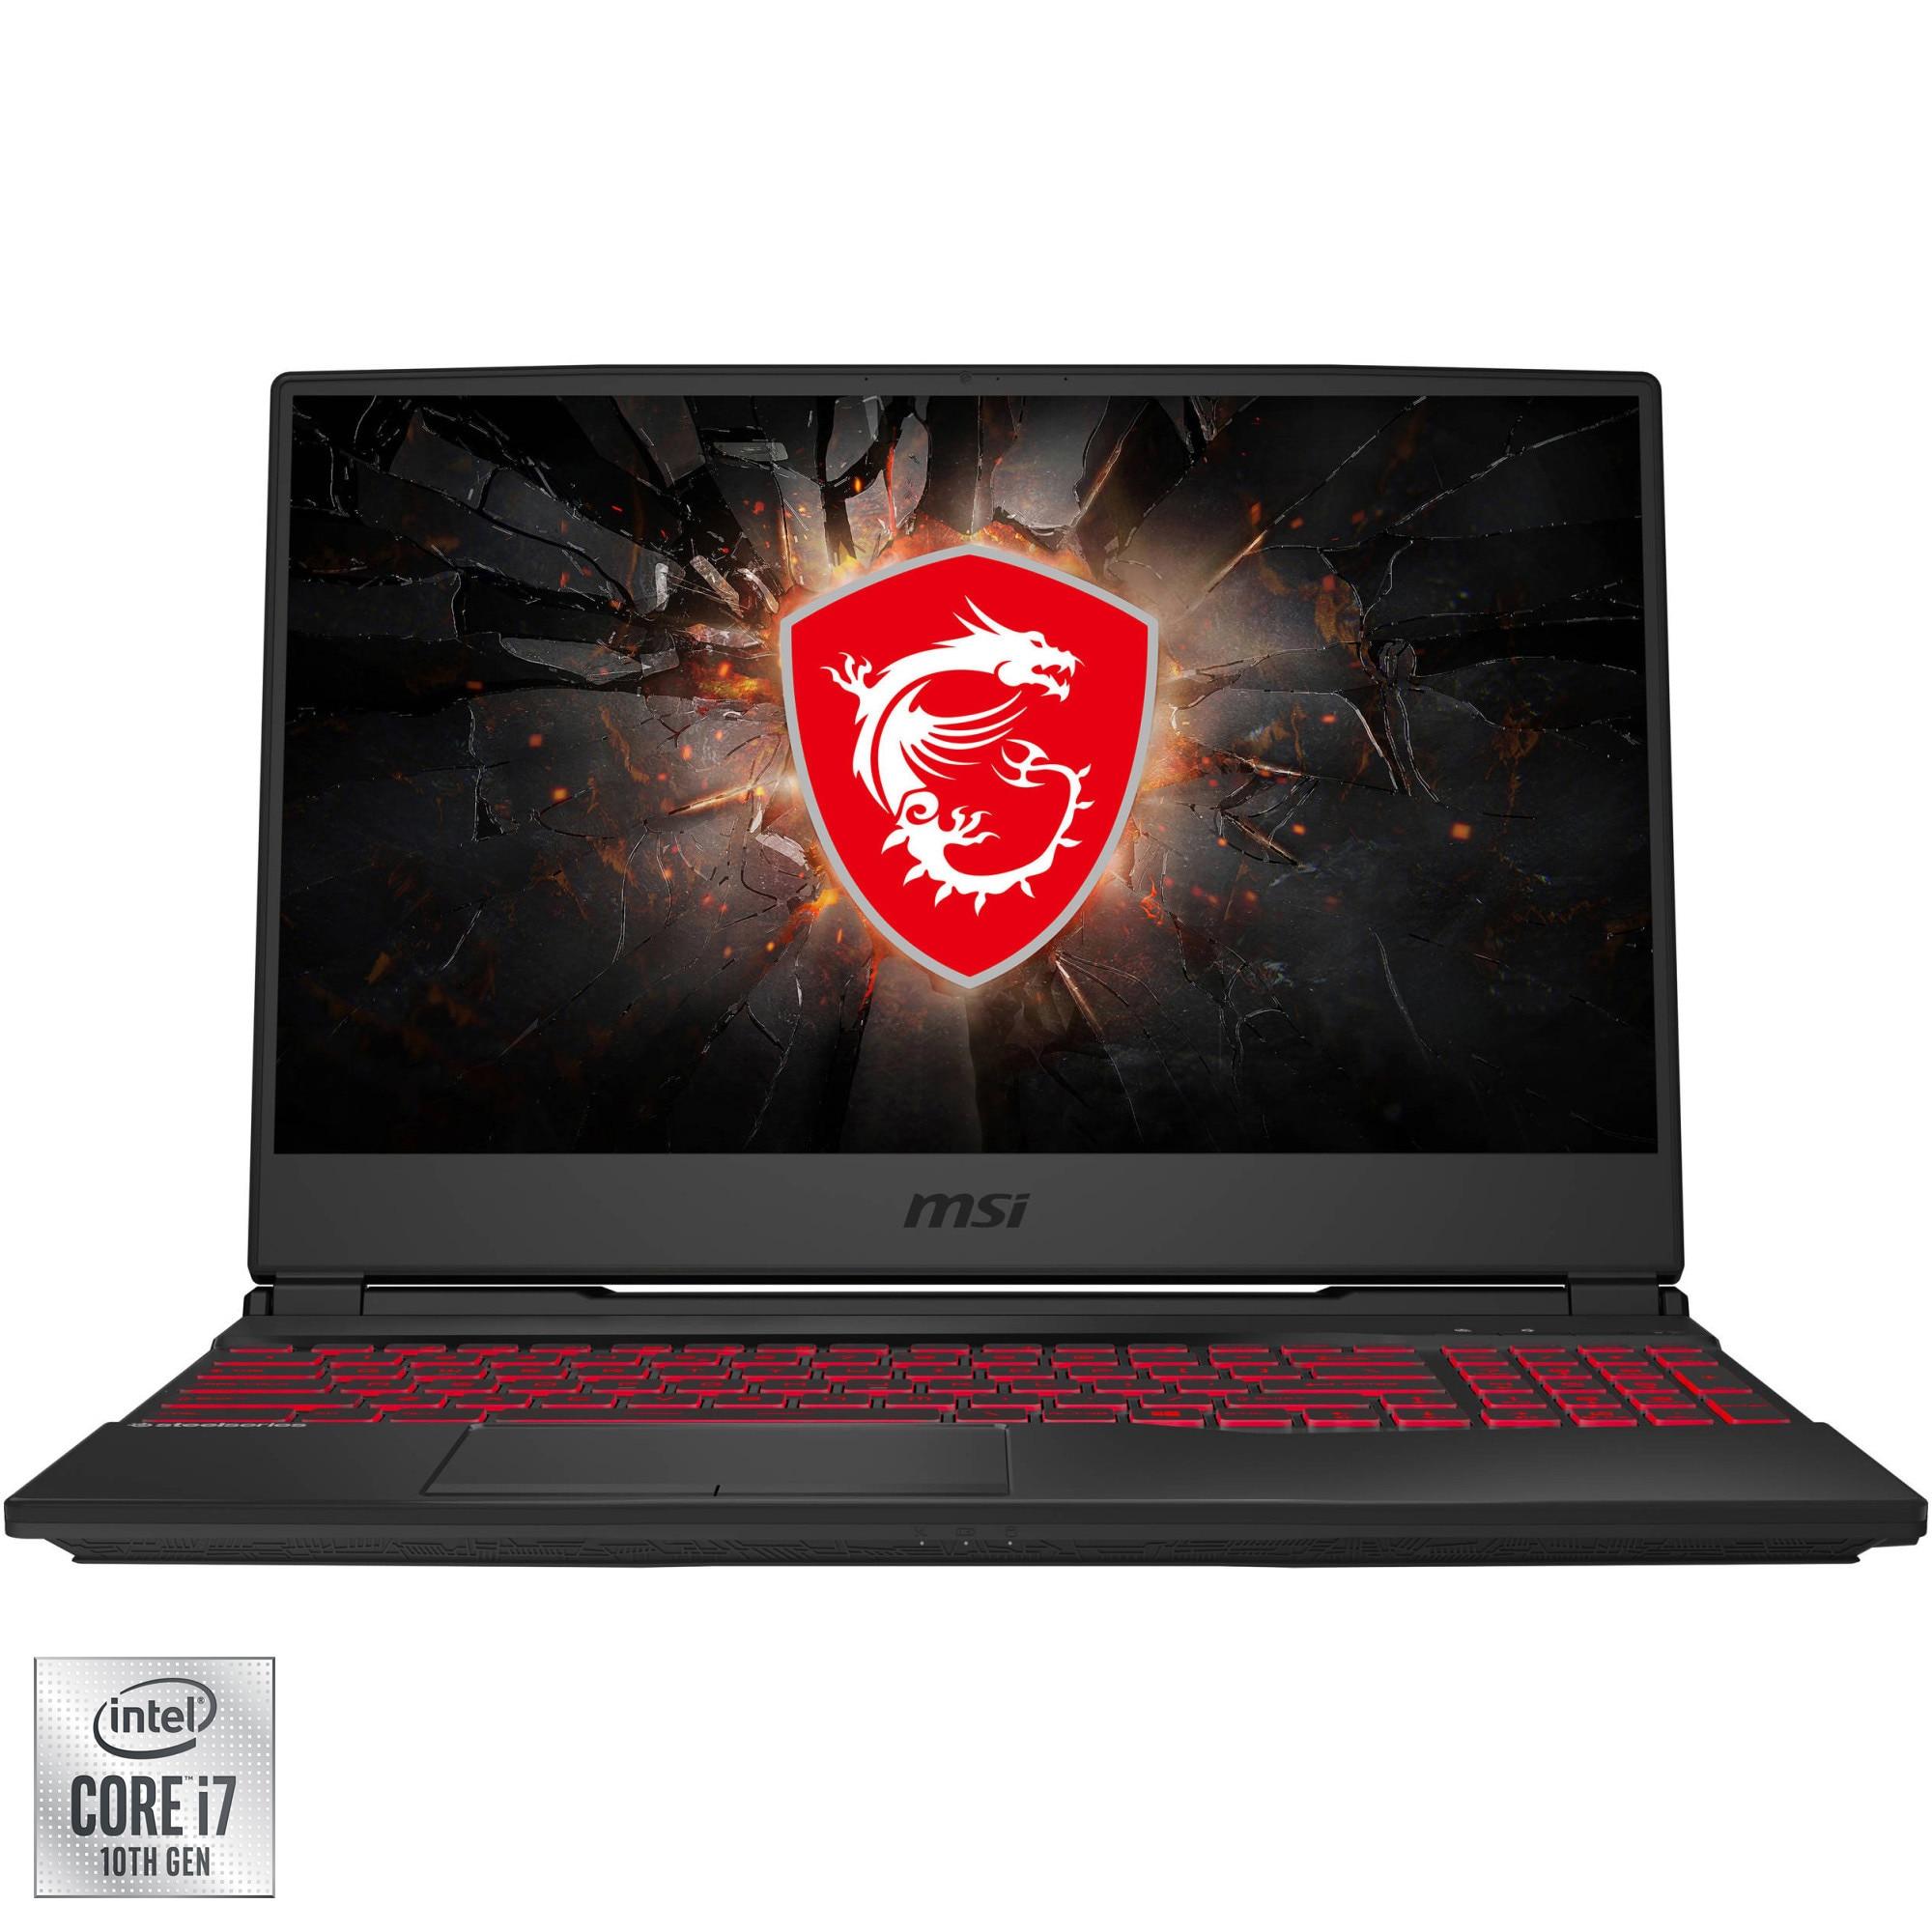 "Fotografie Laptop Gaming MSI GL65 Leopard 10SFSK-279XRO cu procesor Intel Core i7-10750H pana la 5.00 GHz, 15.6"", Full HD, 144Hz, 16GB, 512GB SSD, NVIDIA GeForce RTX2070 Super 8GB, Free DOS, Black"